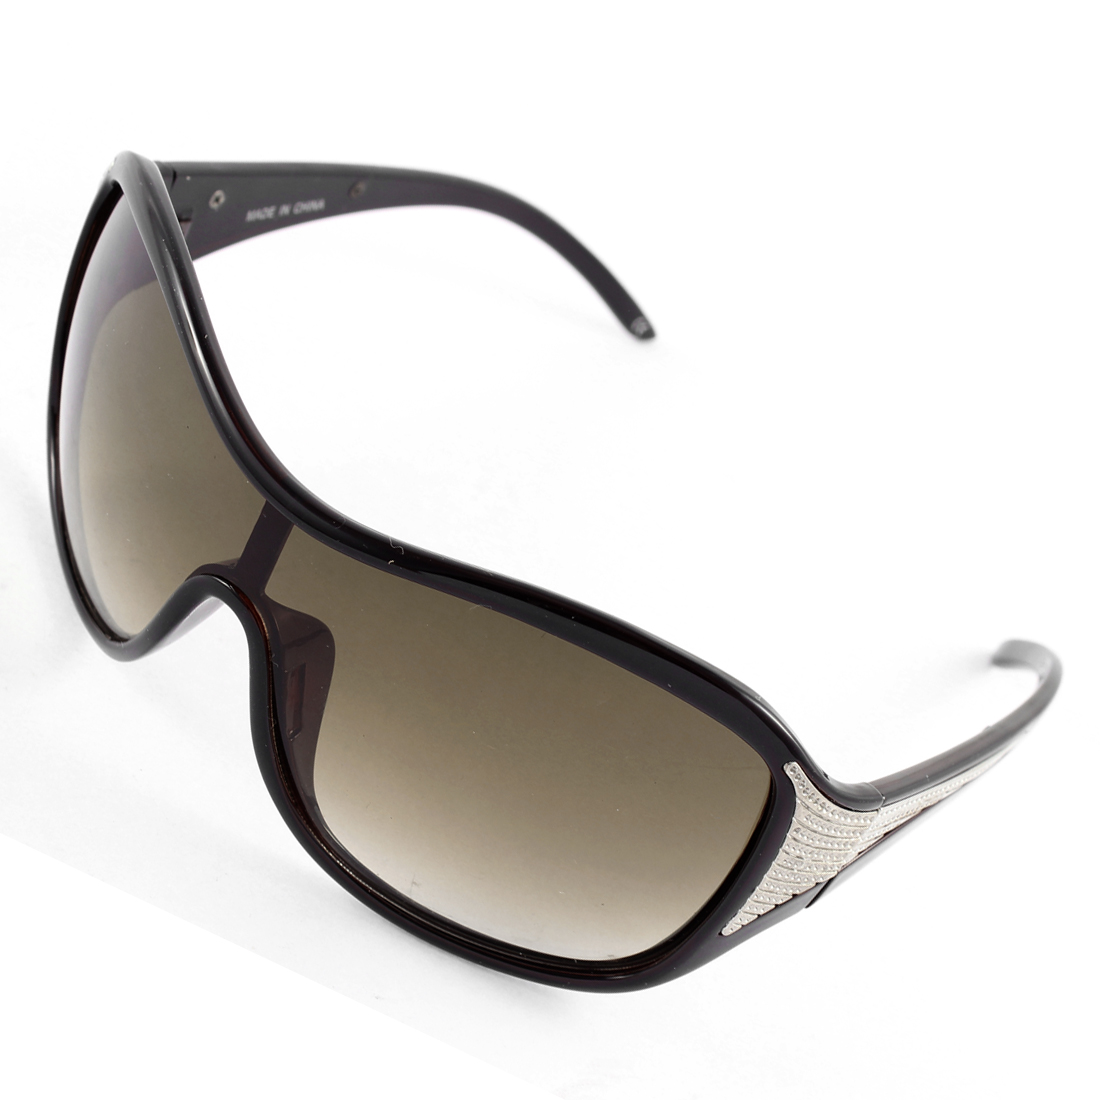 Retro Stylish Full Rim Lady Sunglasses Sun Protection Eyewear Black